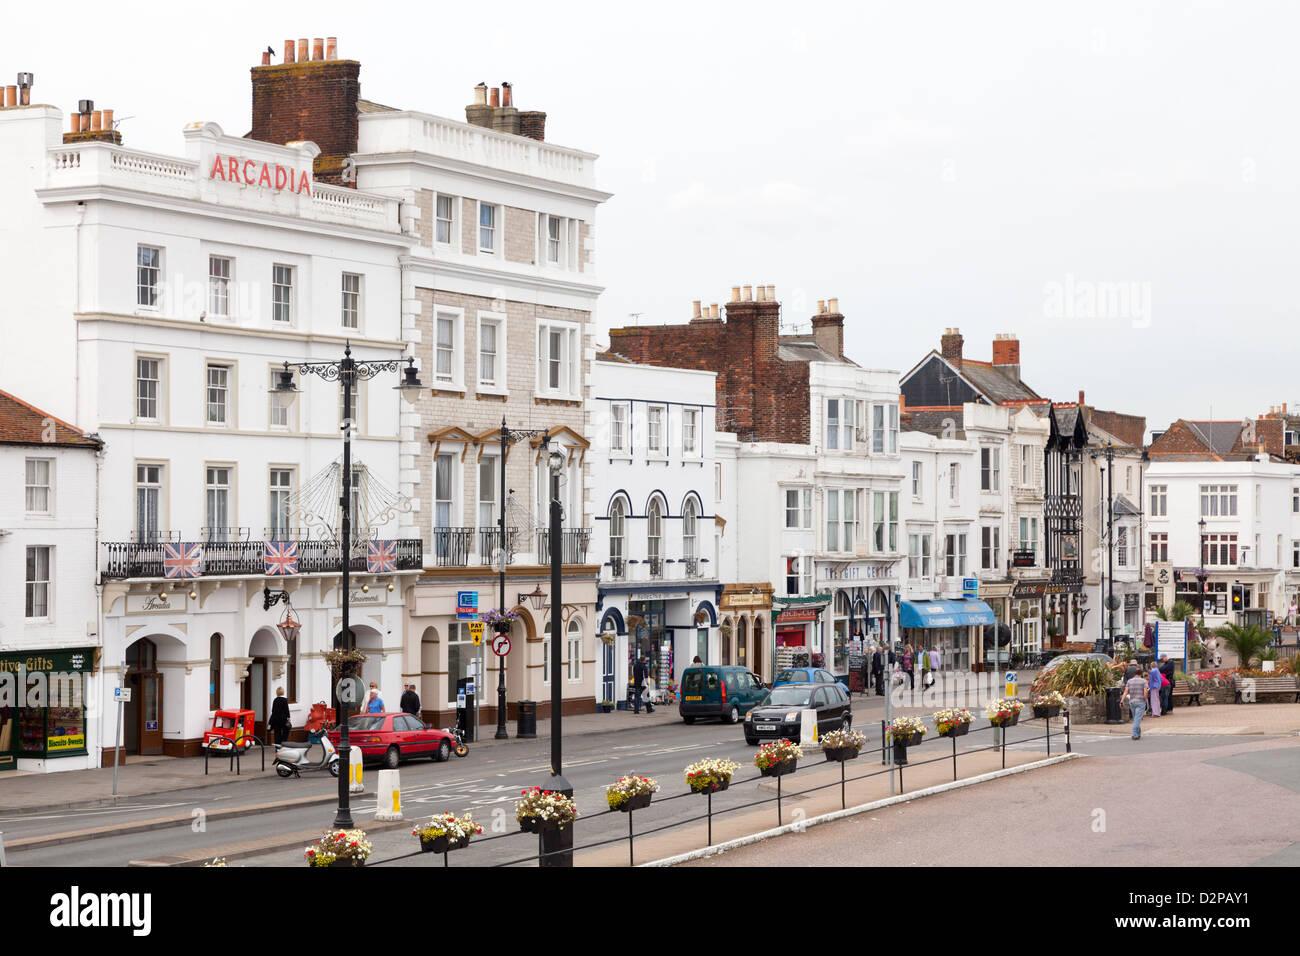 Ryde, Isle of Wight, UK, England. - Stock Image